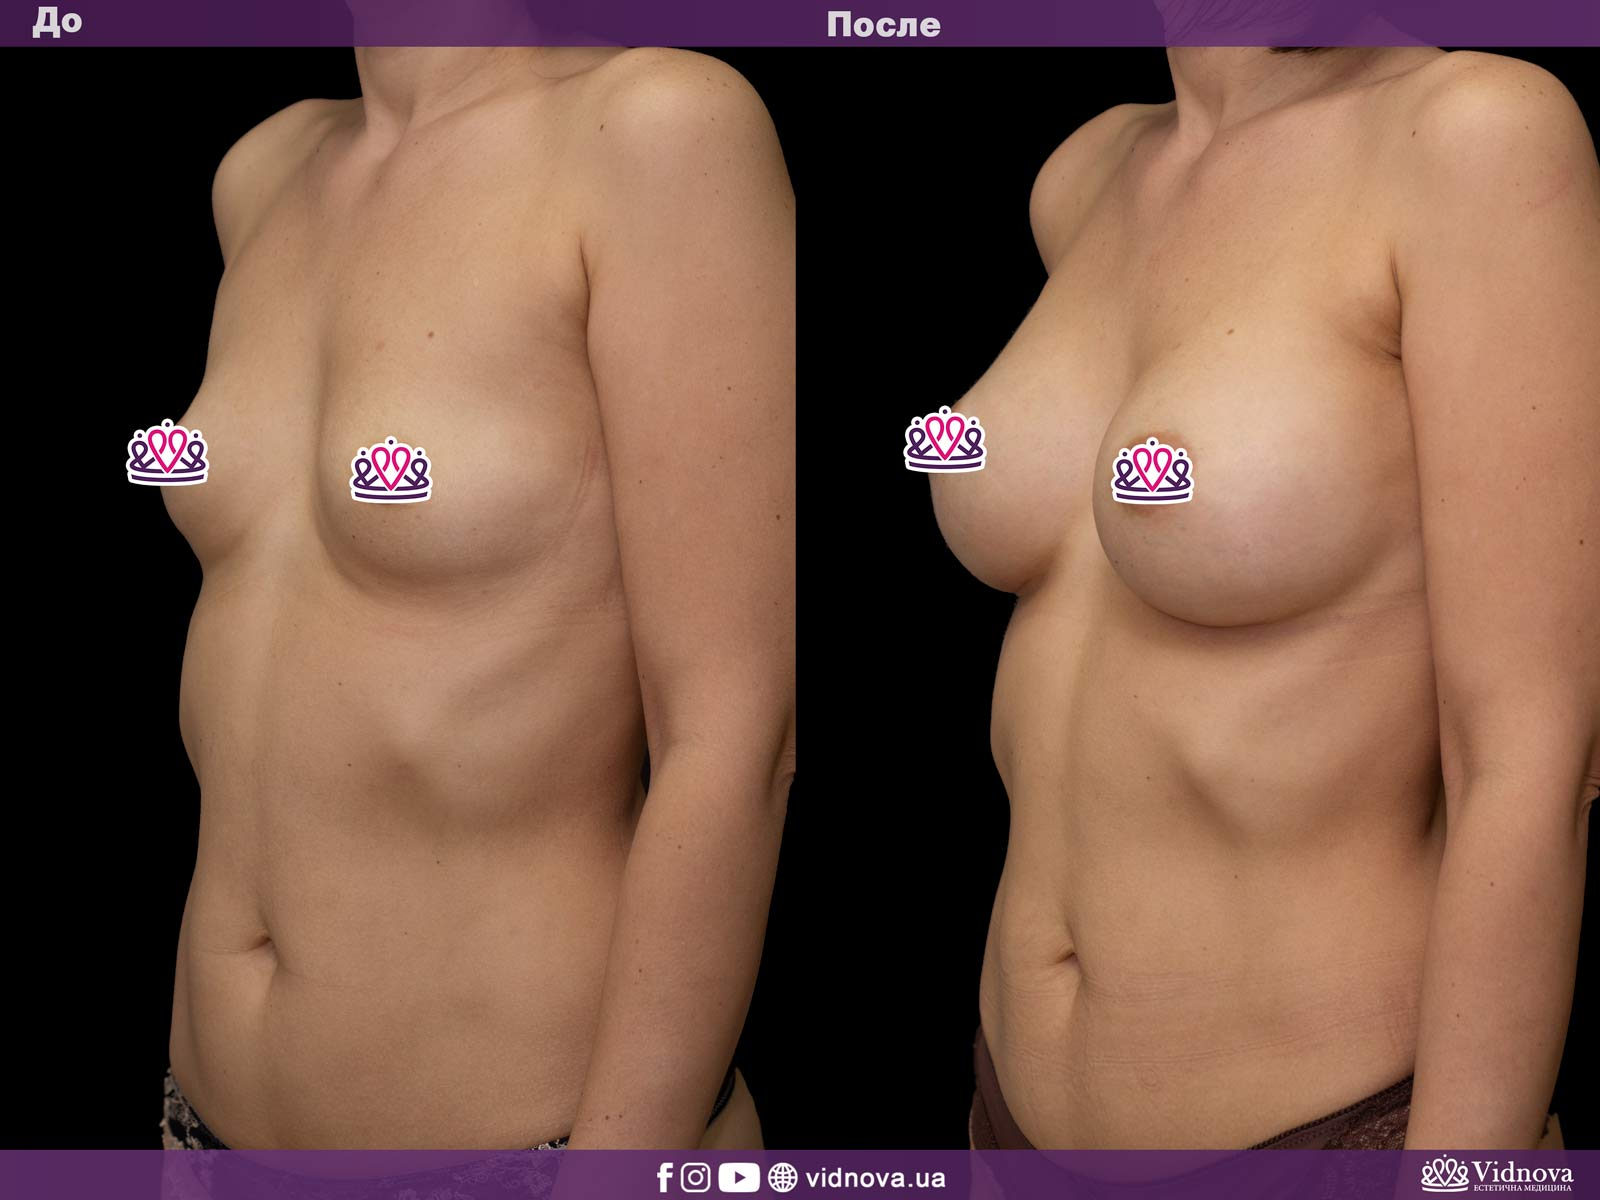 Увеличение груди: Фото ДО и ПОСЛЕ - Пример №9-2 - Клиника Vidnova